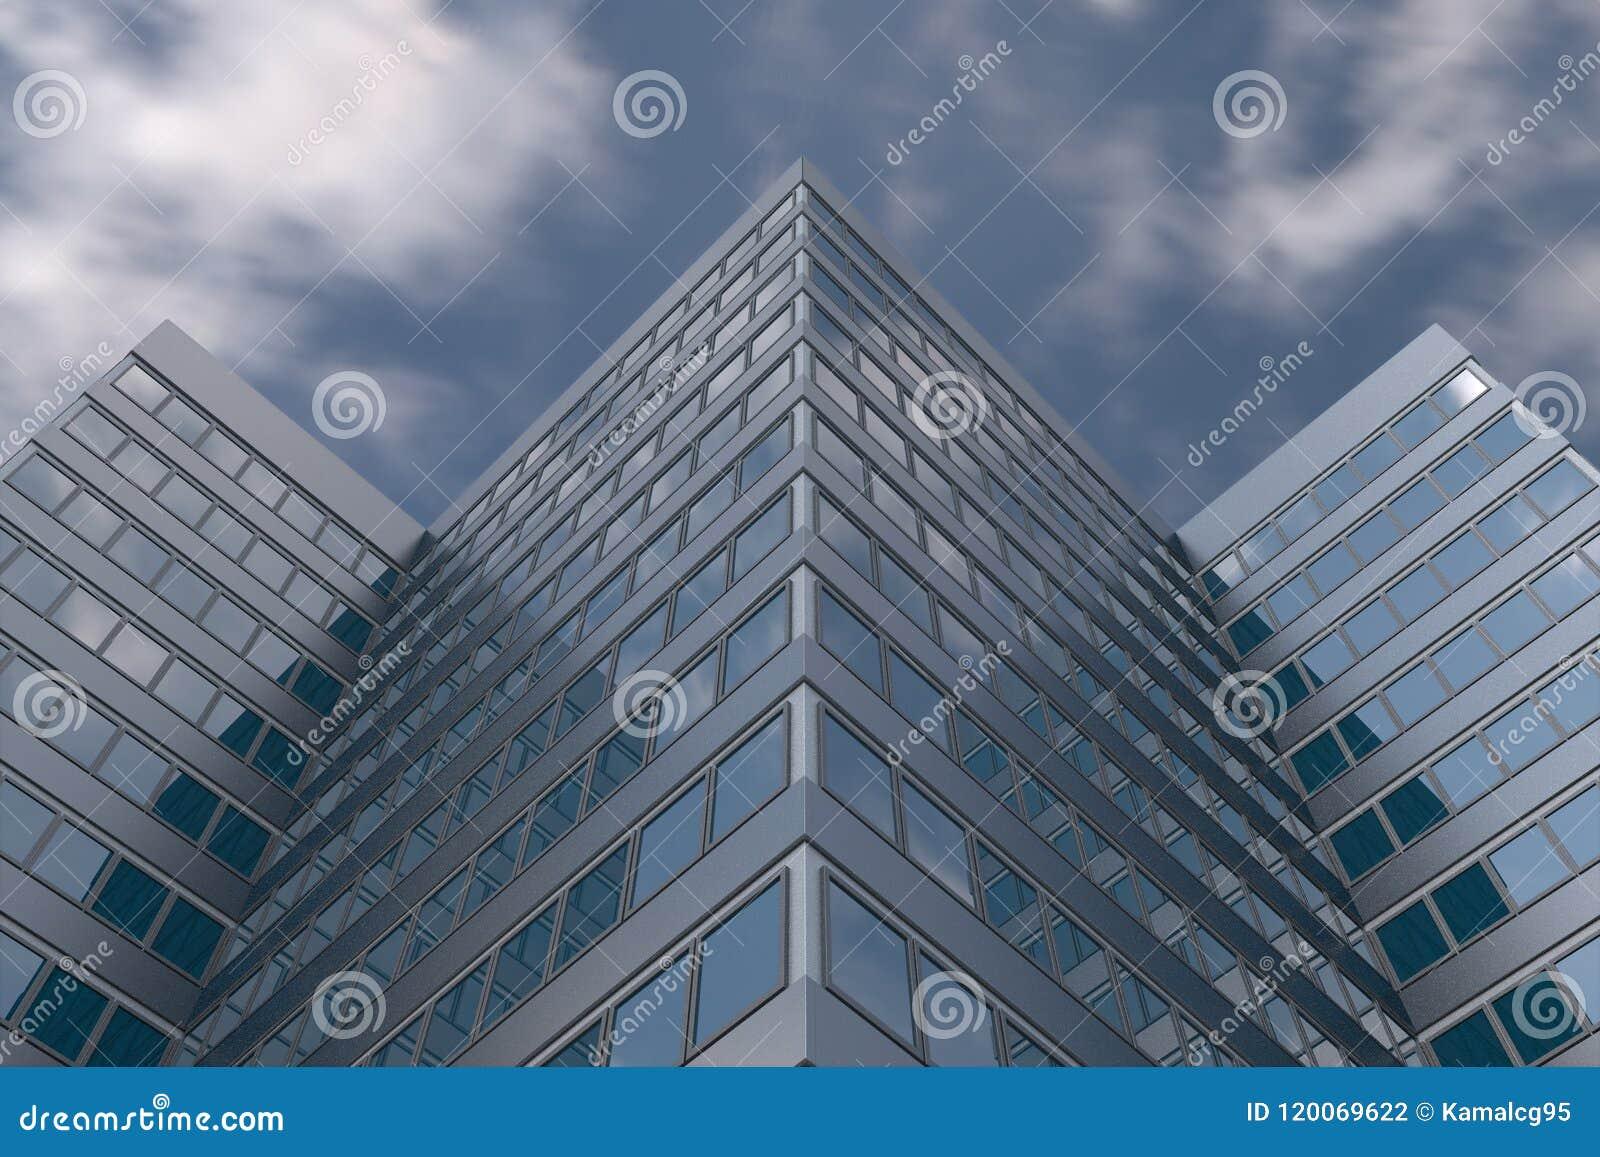 Grattacielo in cielo nuvoloso